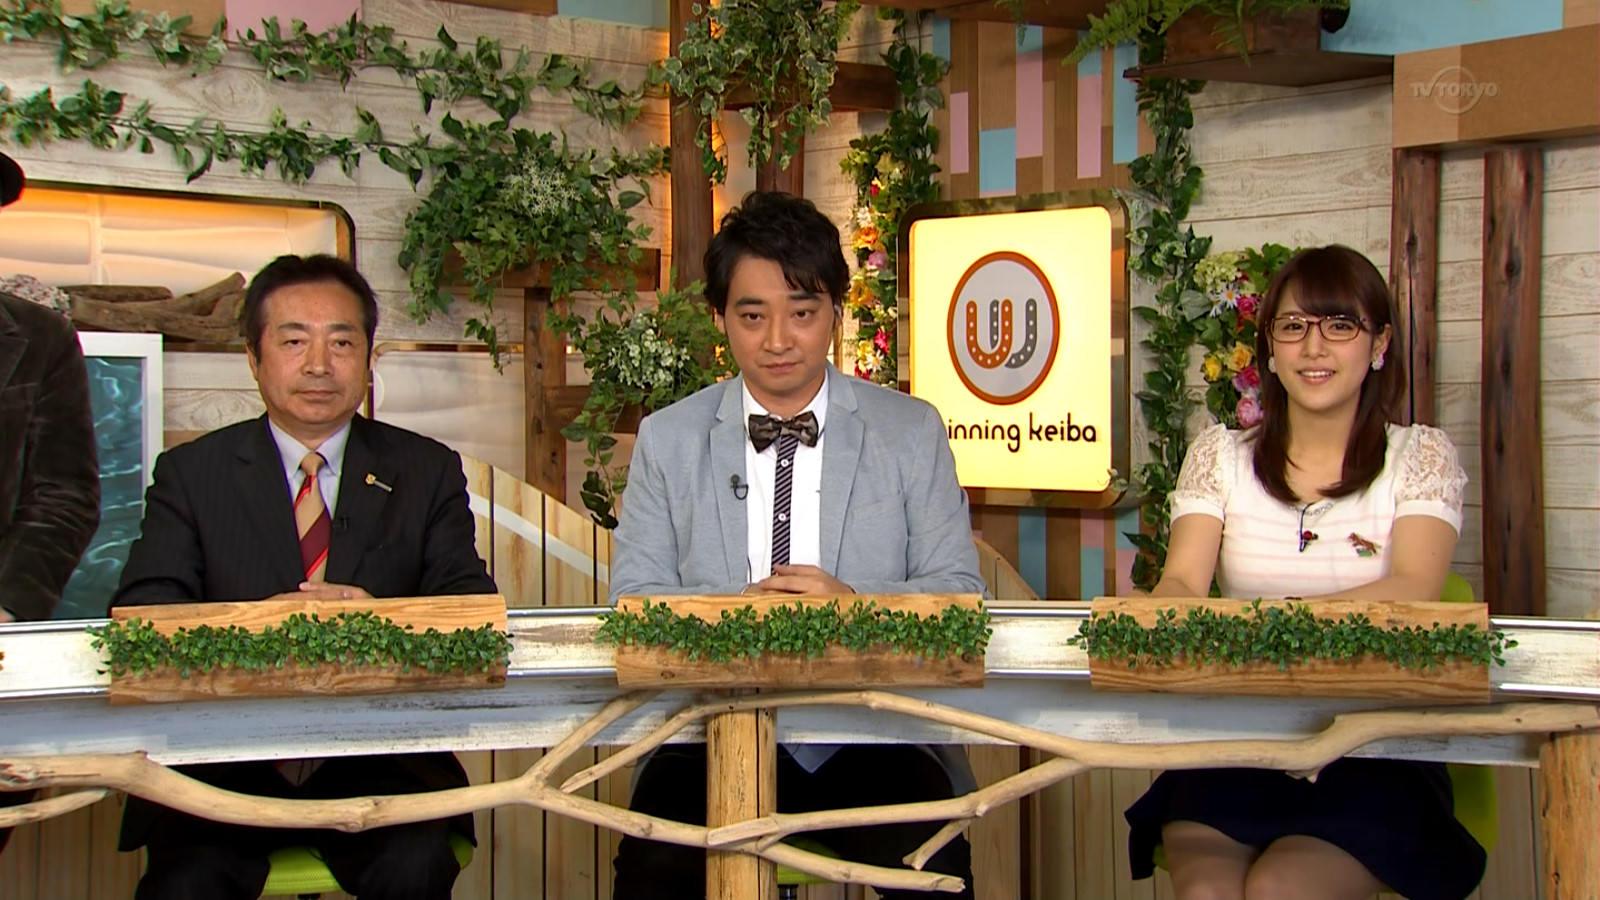 【GIF】鷲見玲奈アナが本日おっぱい発射wwww